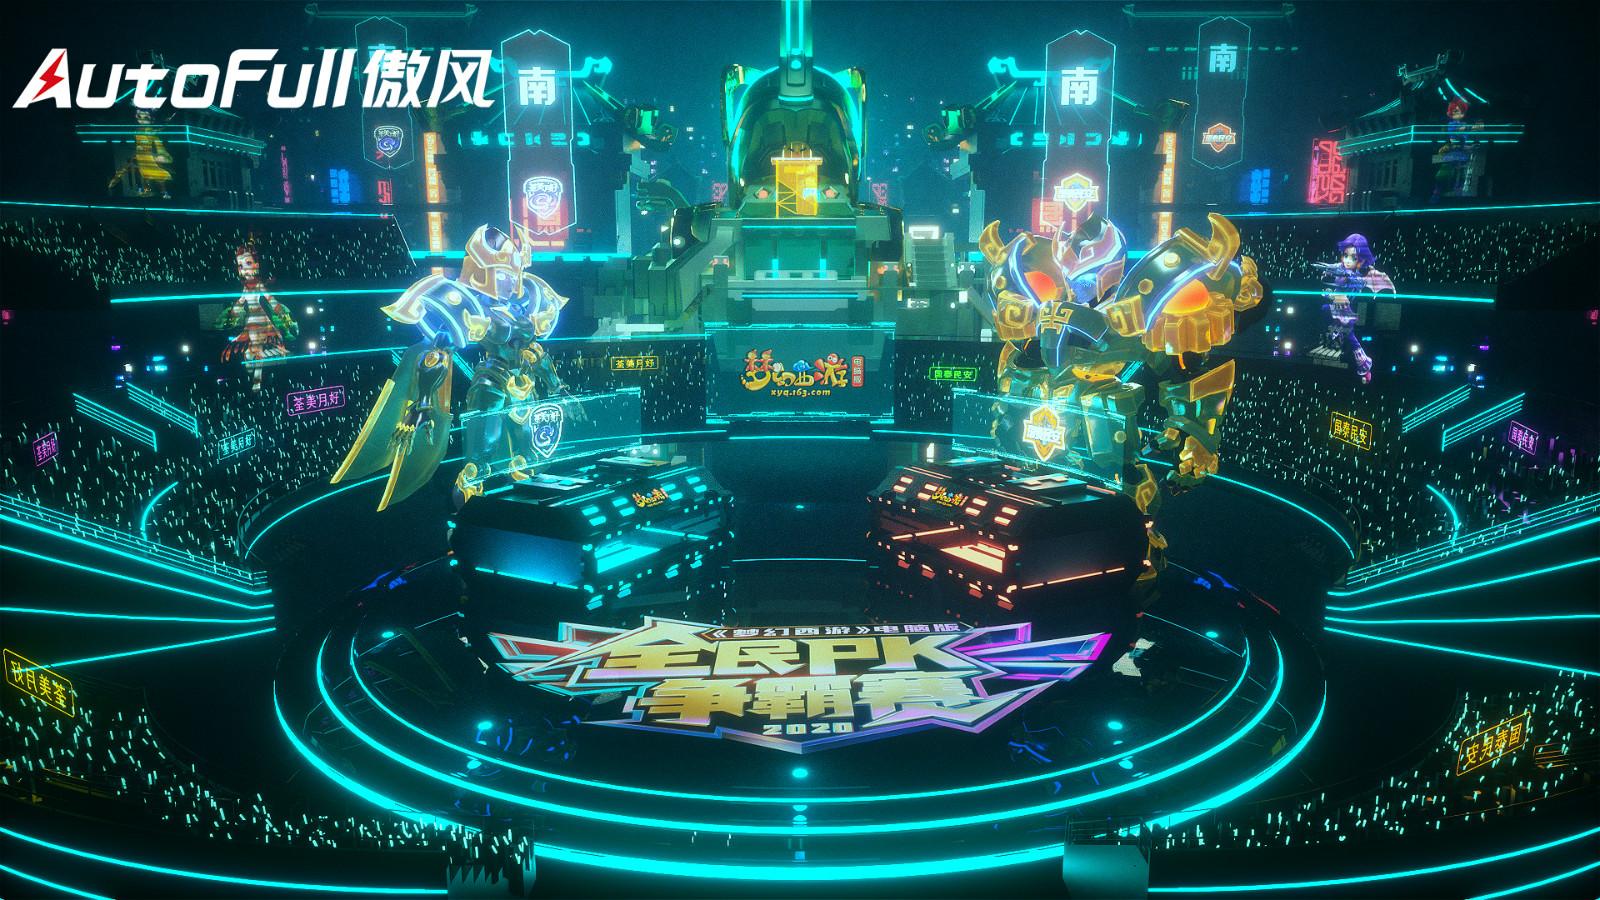 AutoFull傲风助力梦幻西游全民PK赛,打造全球首例虚拟赛事战场